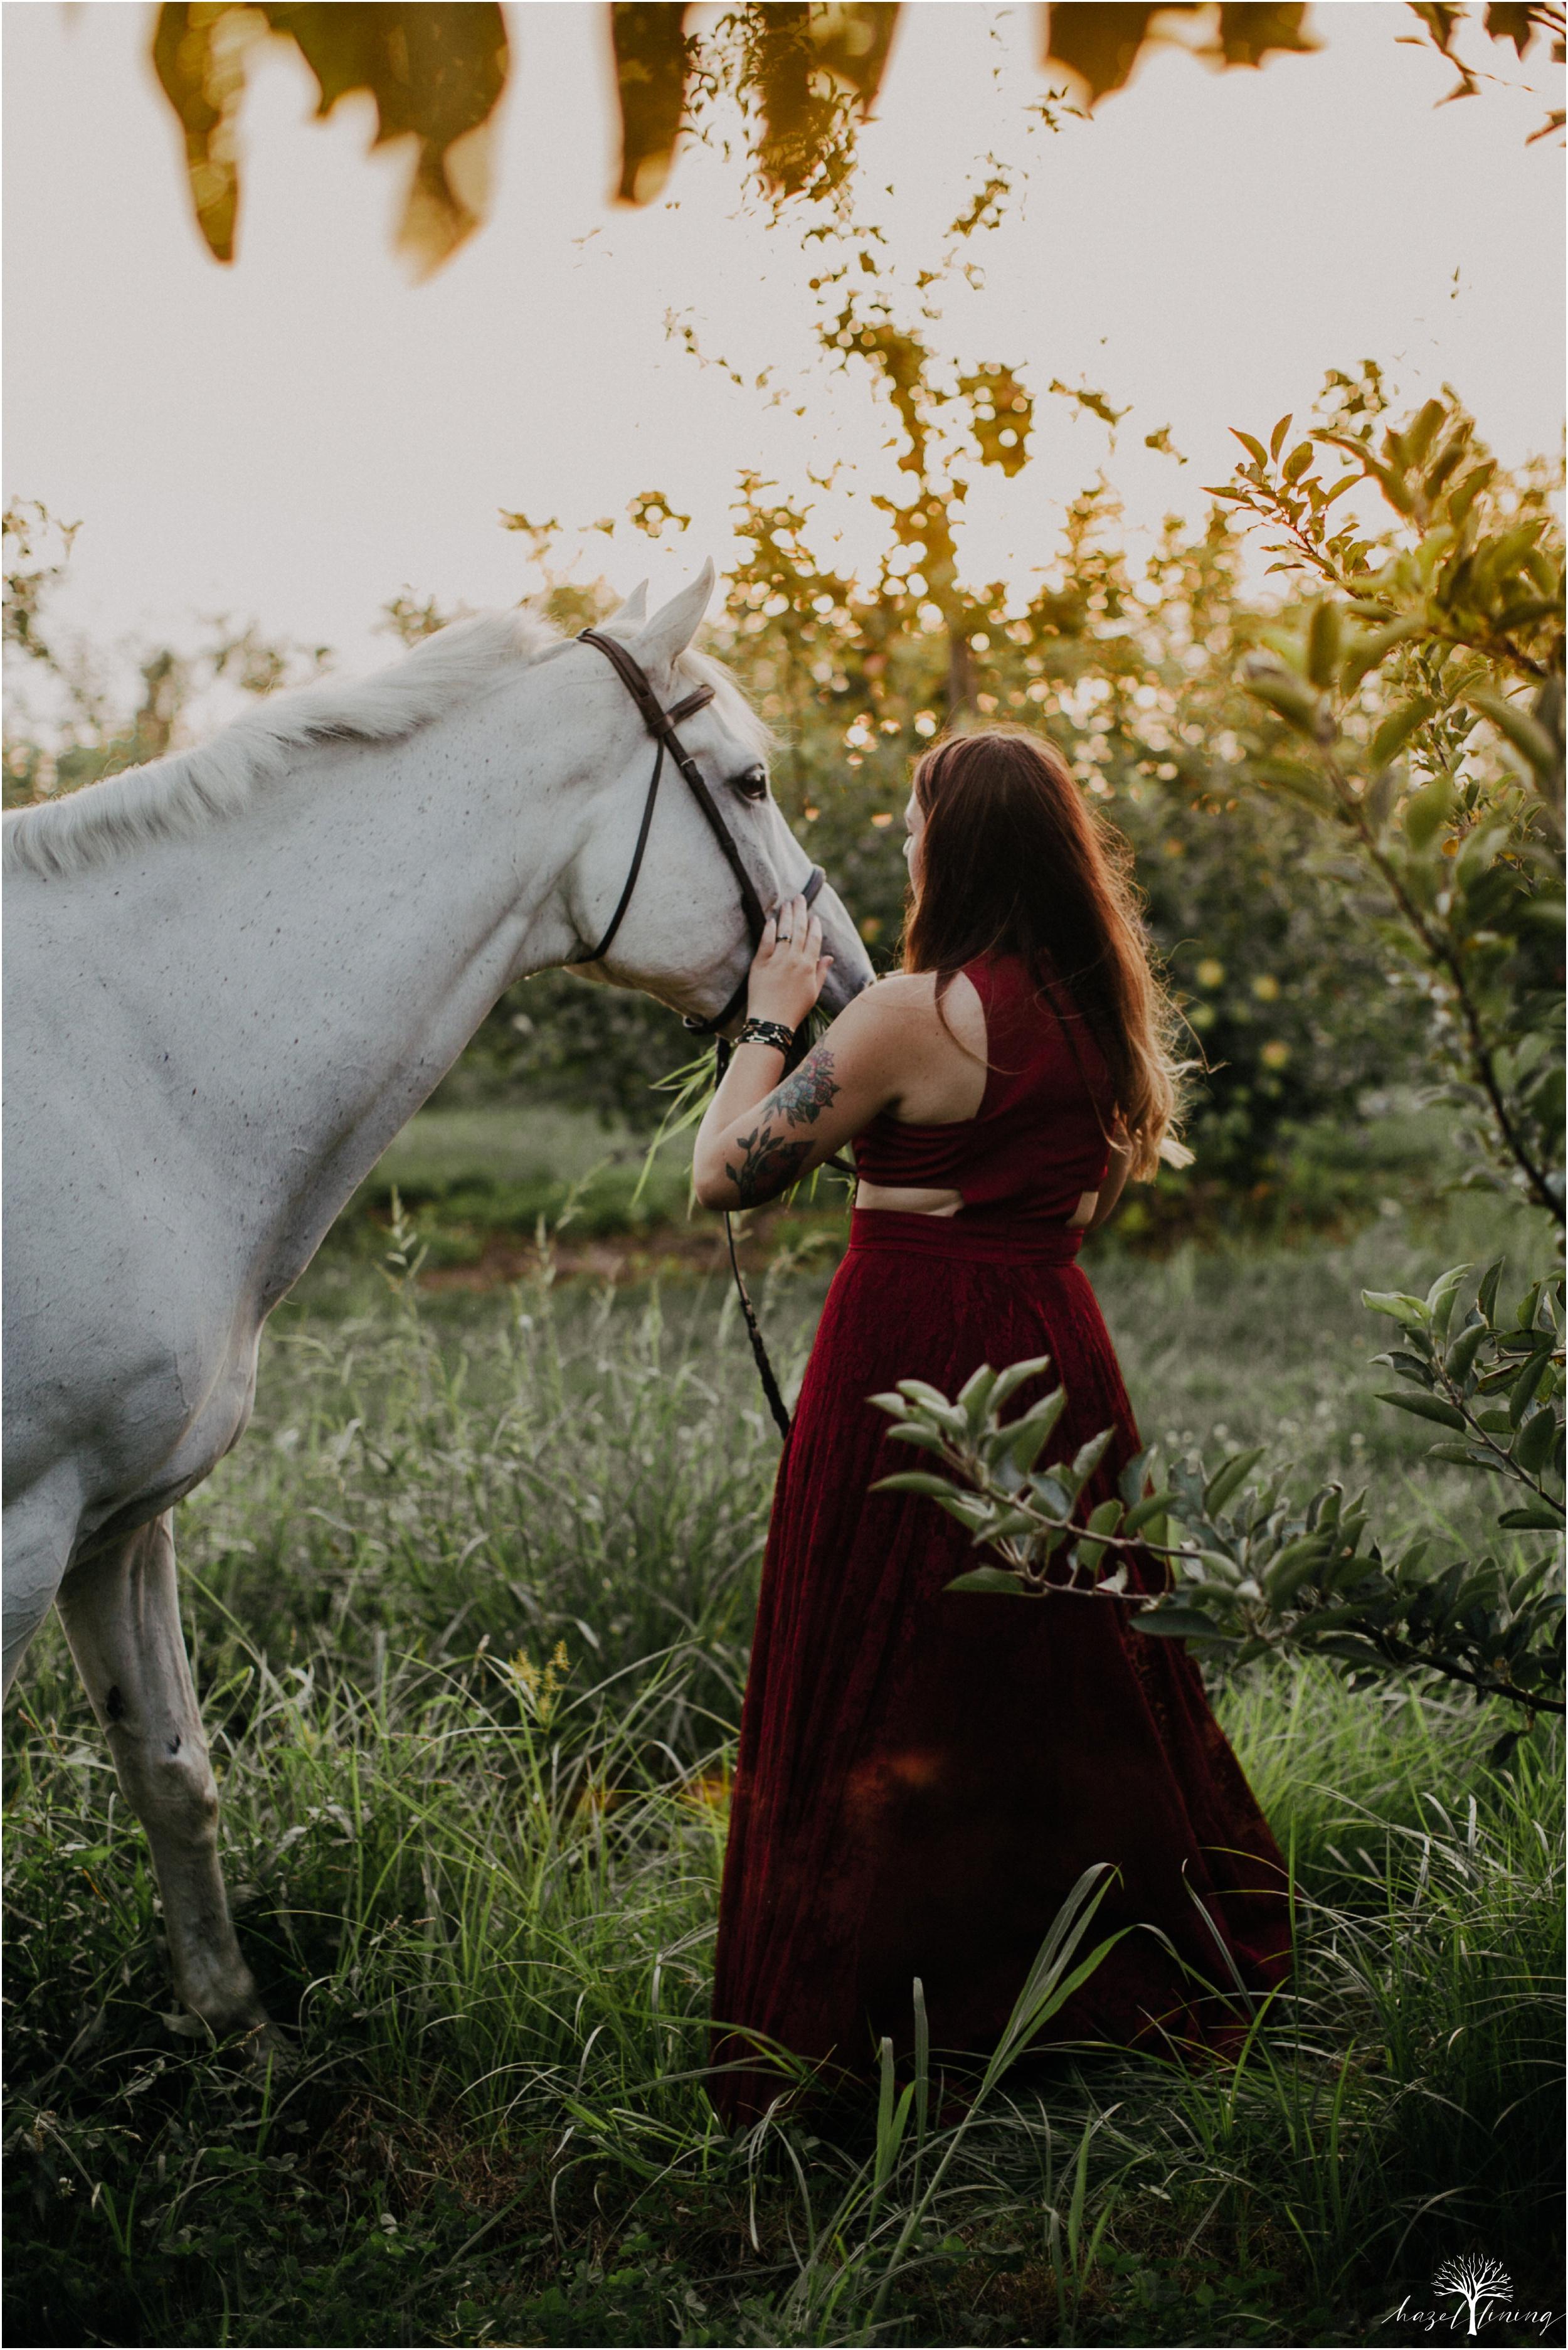 taylor-adams-and-horse-delaware-valley-university-delval-summer-equestrian-portrait-session-hazel-lining-photography-destination-elopement-wedding-engagement-photography_0077.jpg